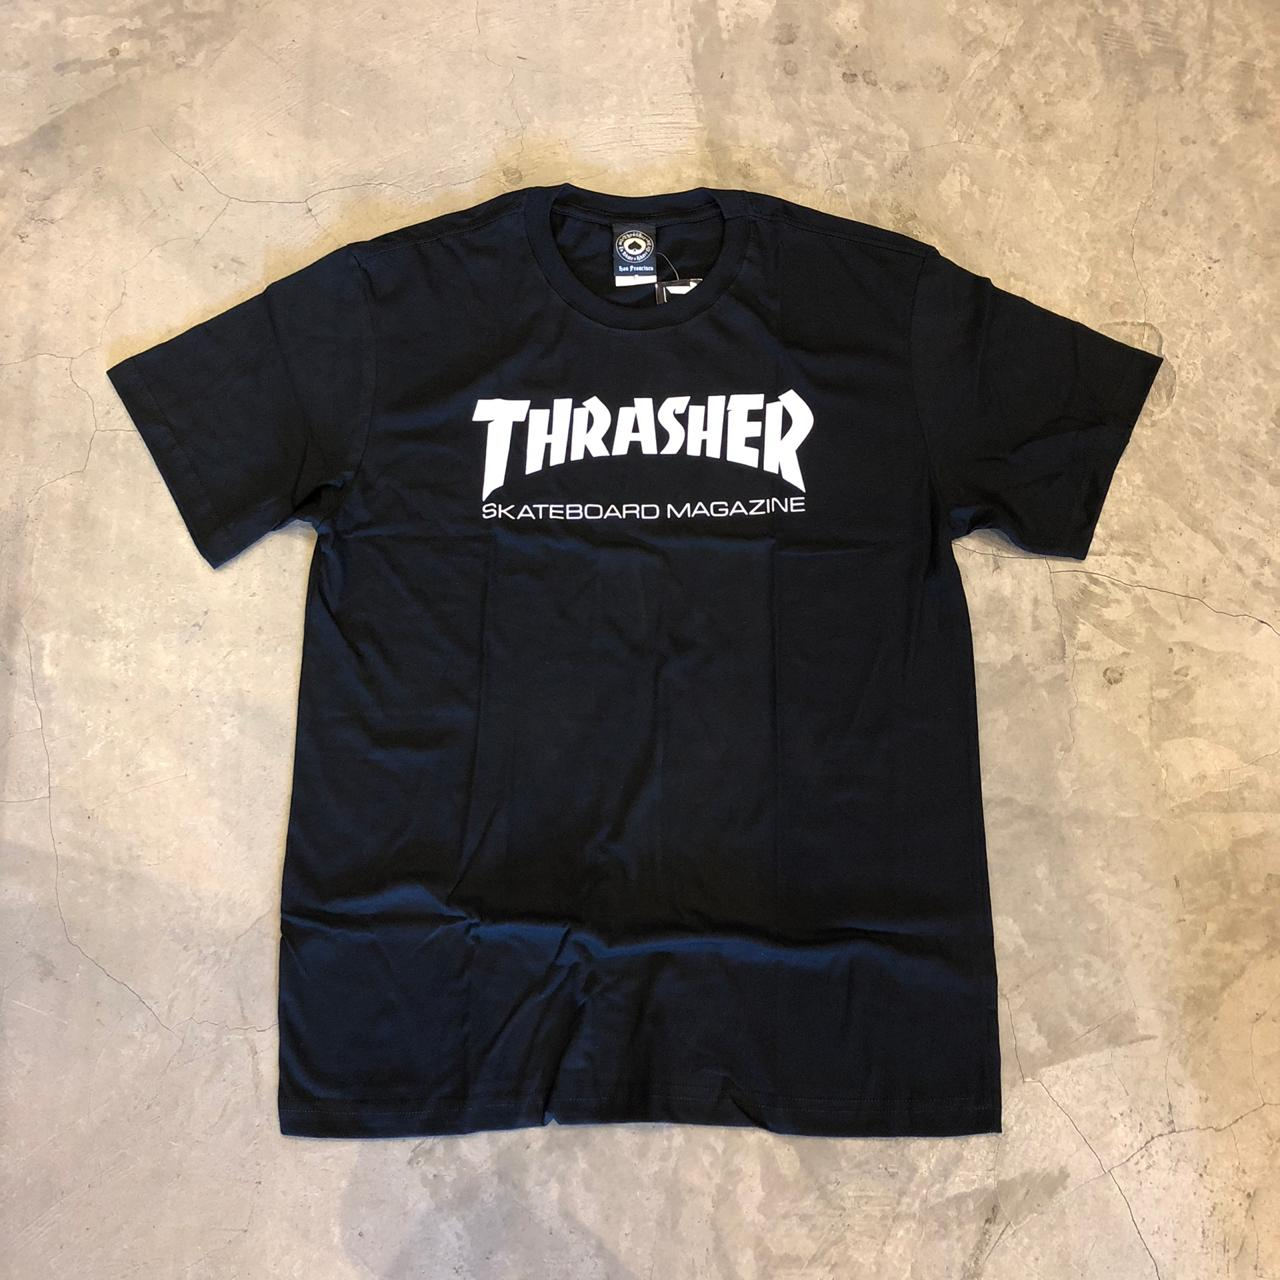 316d85903 Camiseta Thrasher